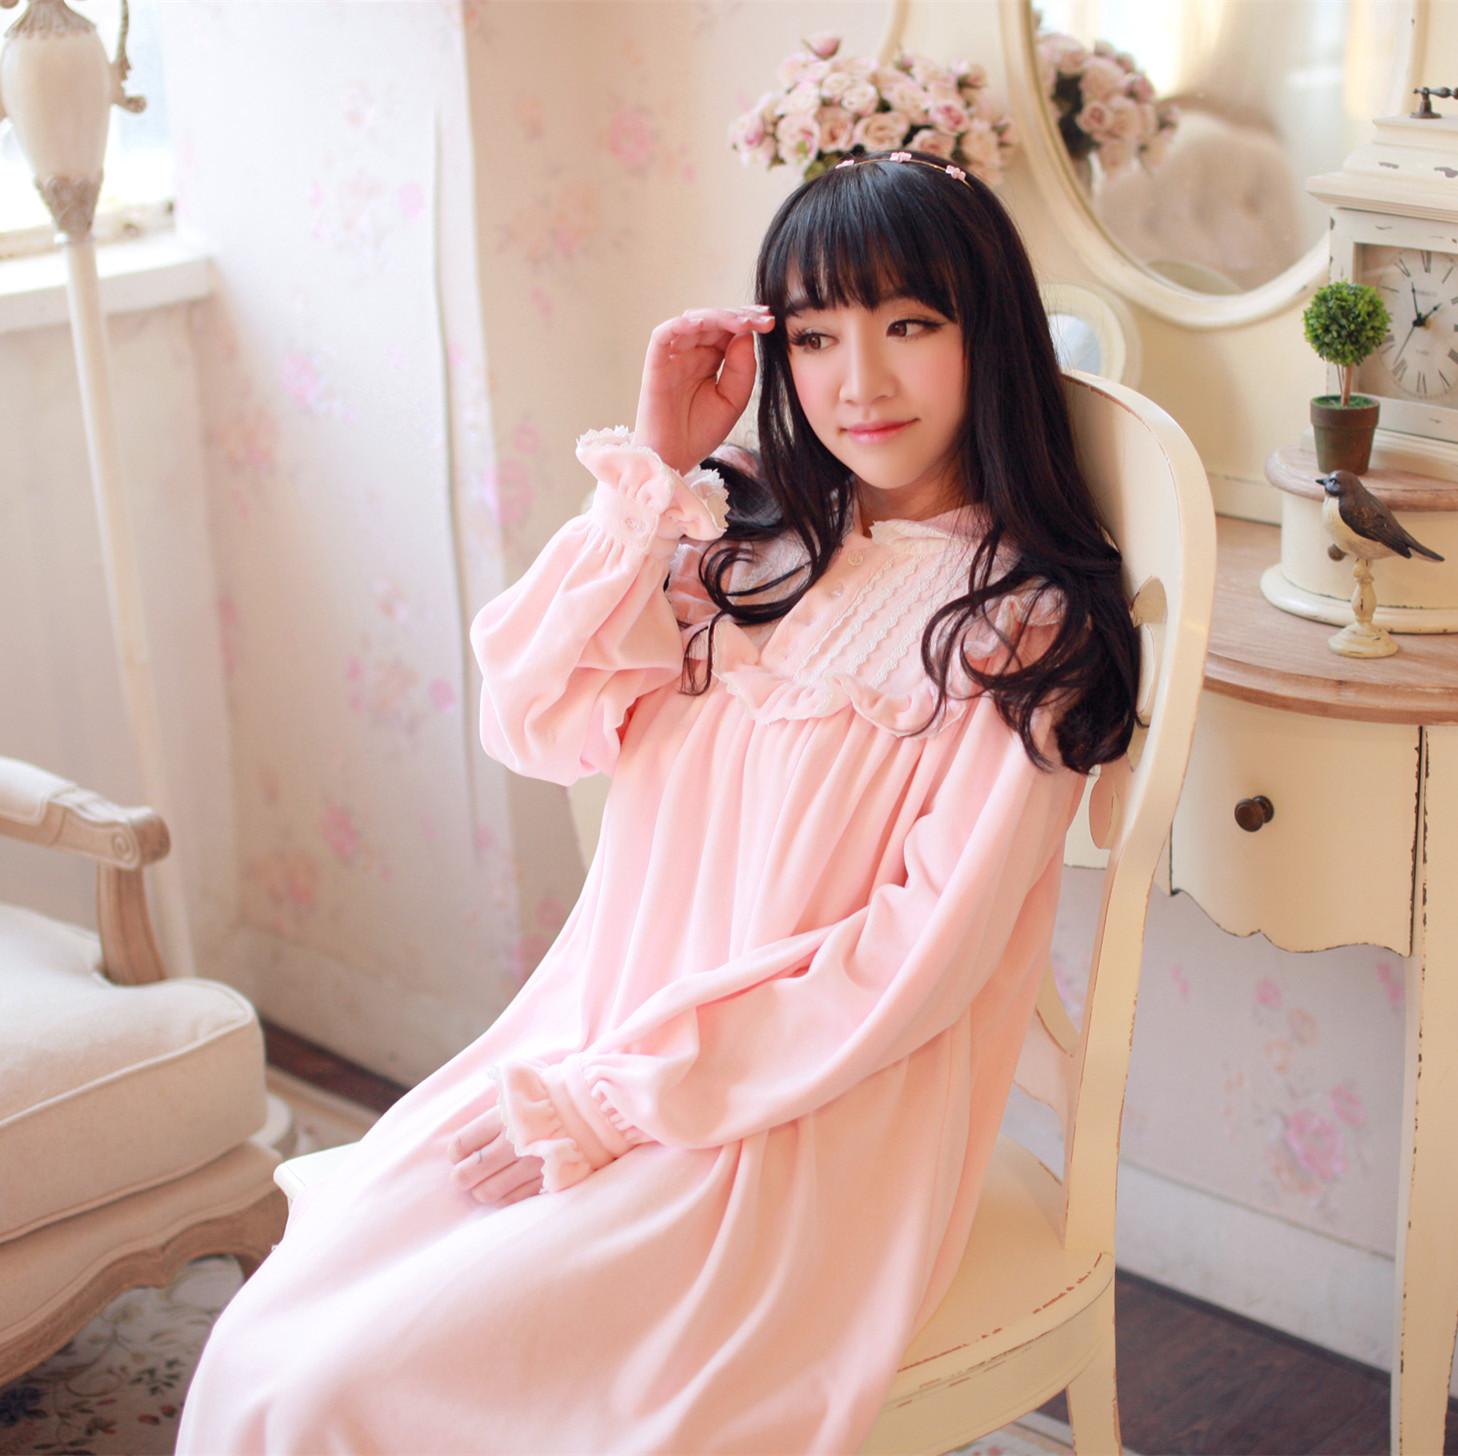 da9d368694 Roman Holiday Hepburn velvet Princess nightdress court retro style cotton  velvet pajamas women long-sleeved nightdress